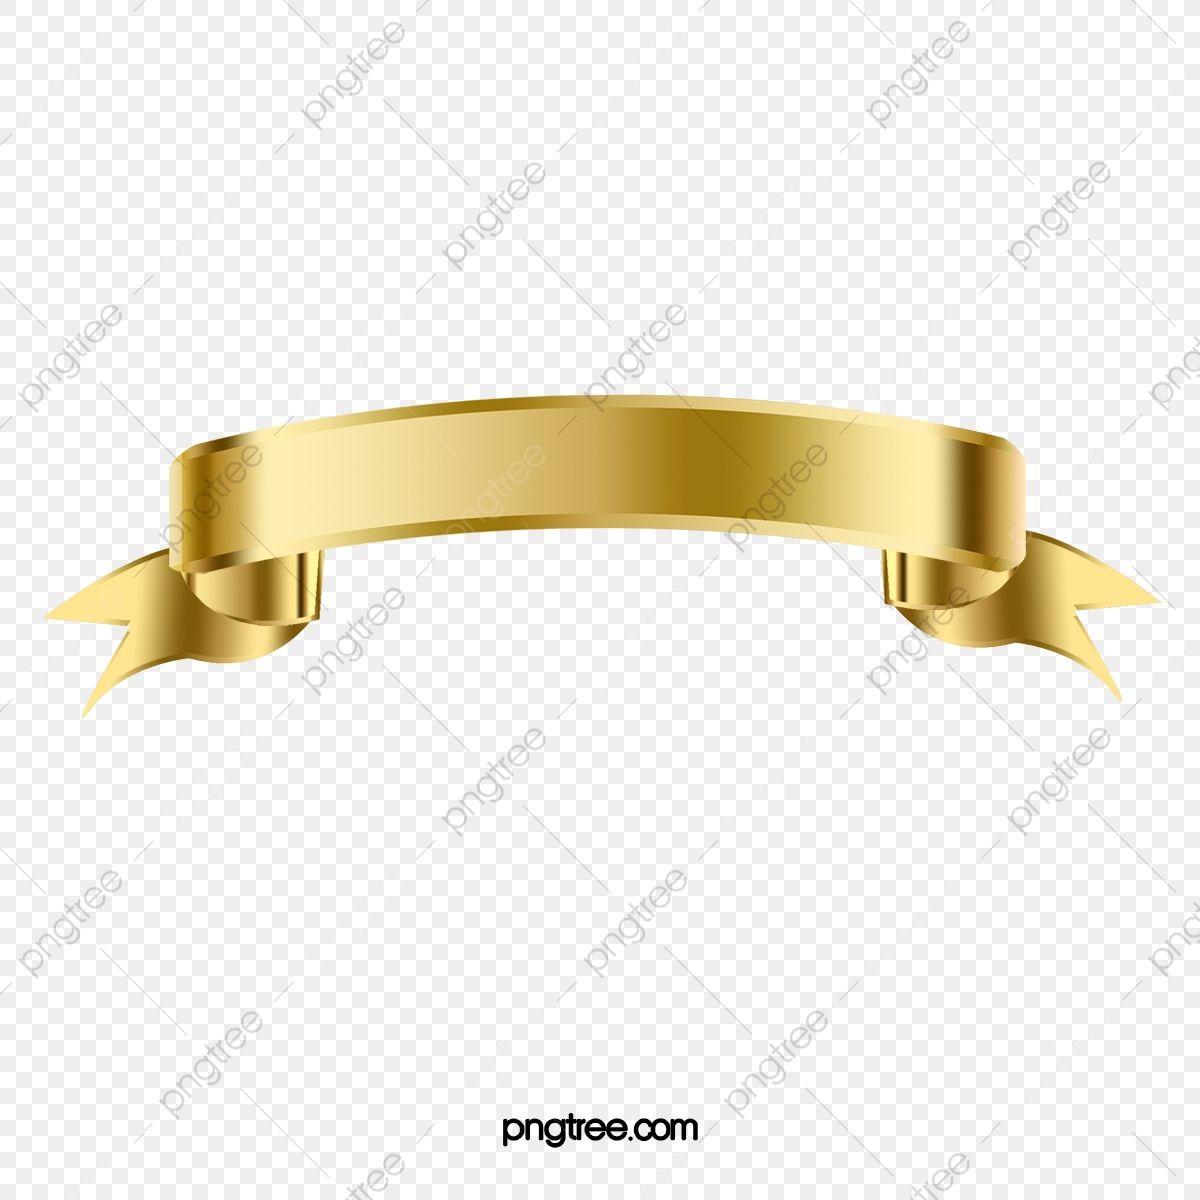 Gold Ribbon Box Title Ribbon Clipart Golden Ribbon Png Transparent Clipart Image And Psd File For Free Download Ribbon Png Ribbon Box Ribbon Clipart